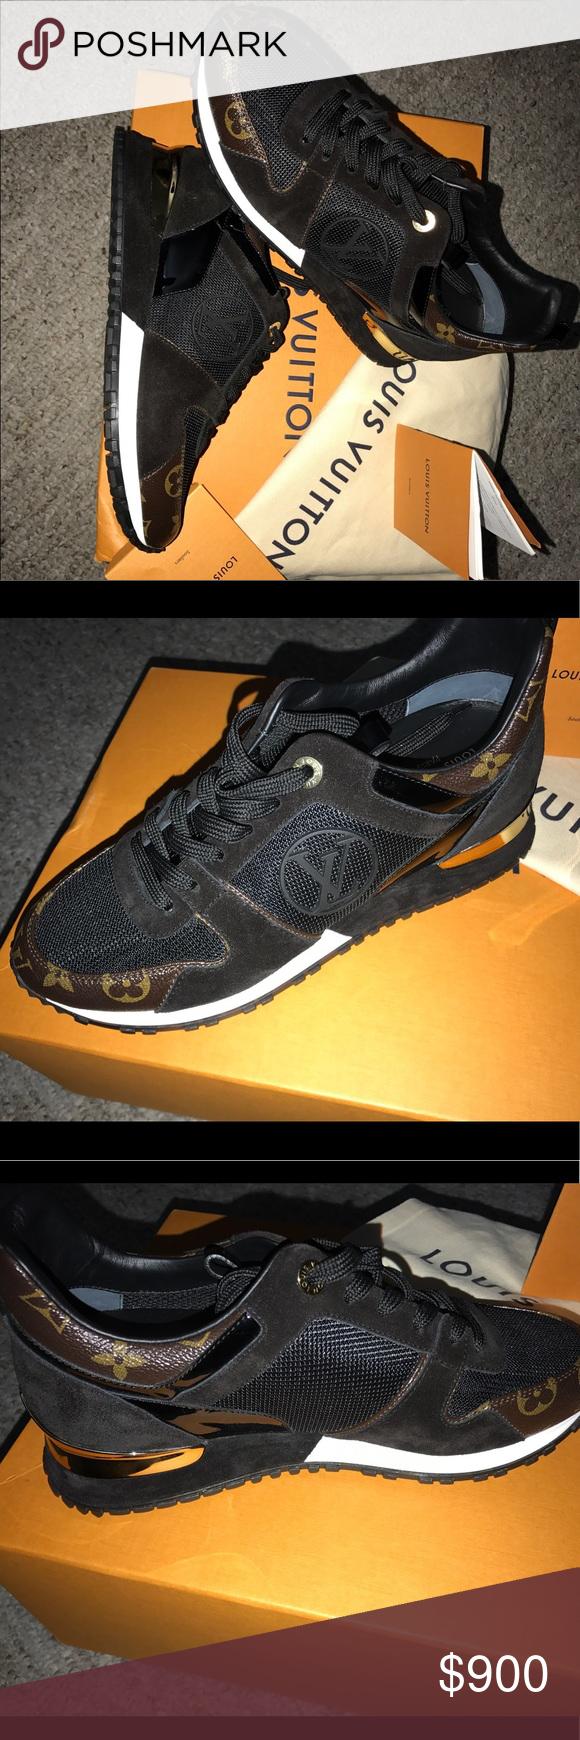 e7389ff9ef1d6 LOUIS VUITTON RUN AWAY BLACK WOMENS SNEAKERS Louis Vuitton sneakers Louis  Vuitton Shoes Athletic Shoes